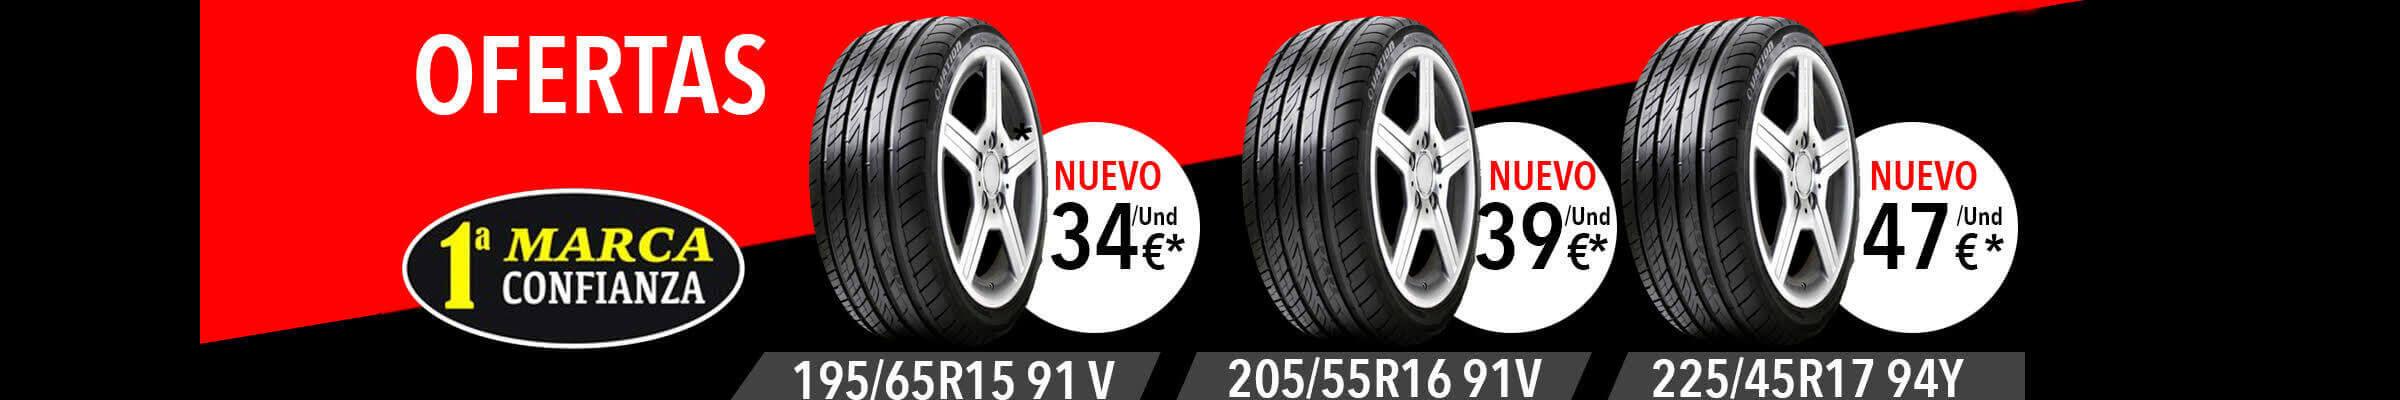 Banner de neumáticos nuevos